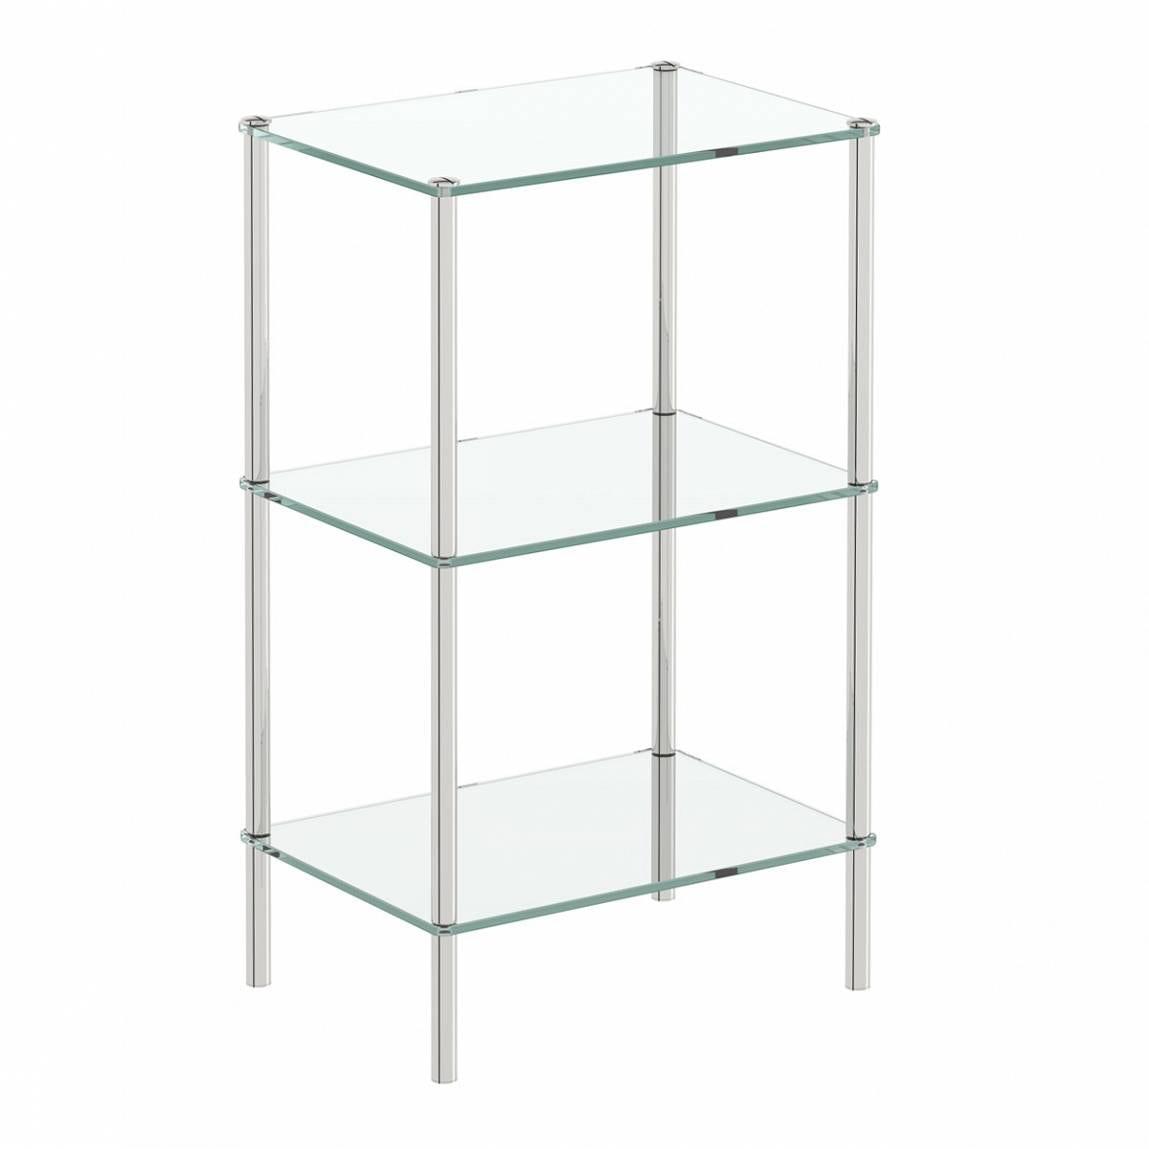 Orchard Options freestanding square 3 glass shelf unit